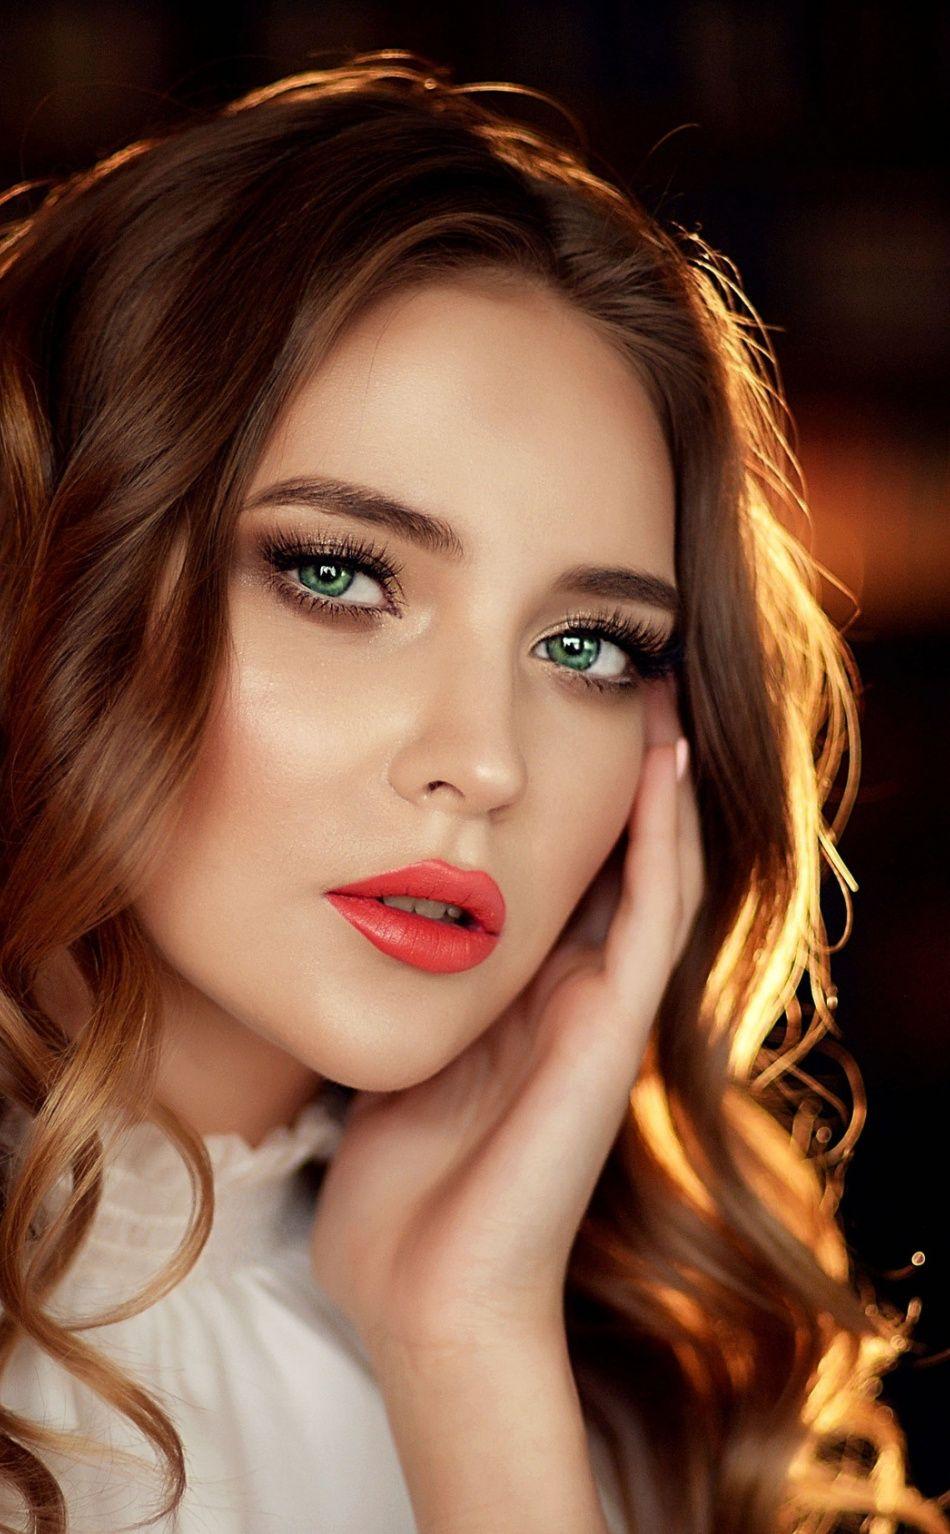 Green Eyes Woman Model Red Lips Portrait 950x1534 Wallpaper Beautiful Hair Color Gorgeous Eyes Beauty Girl